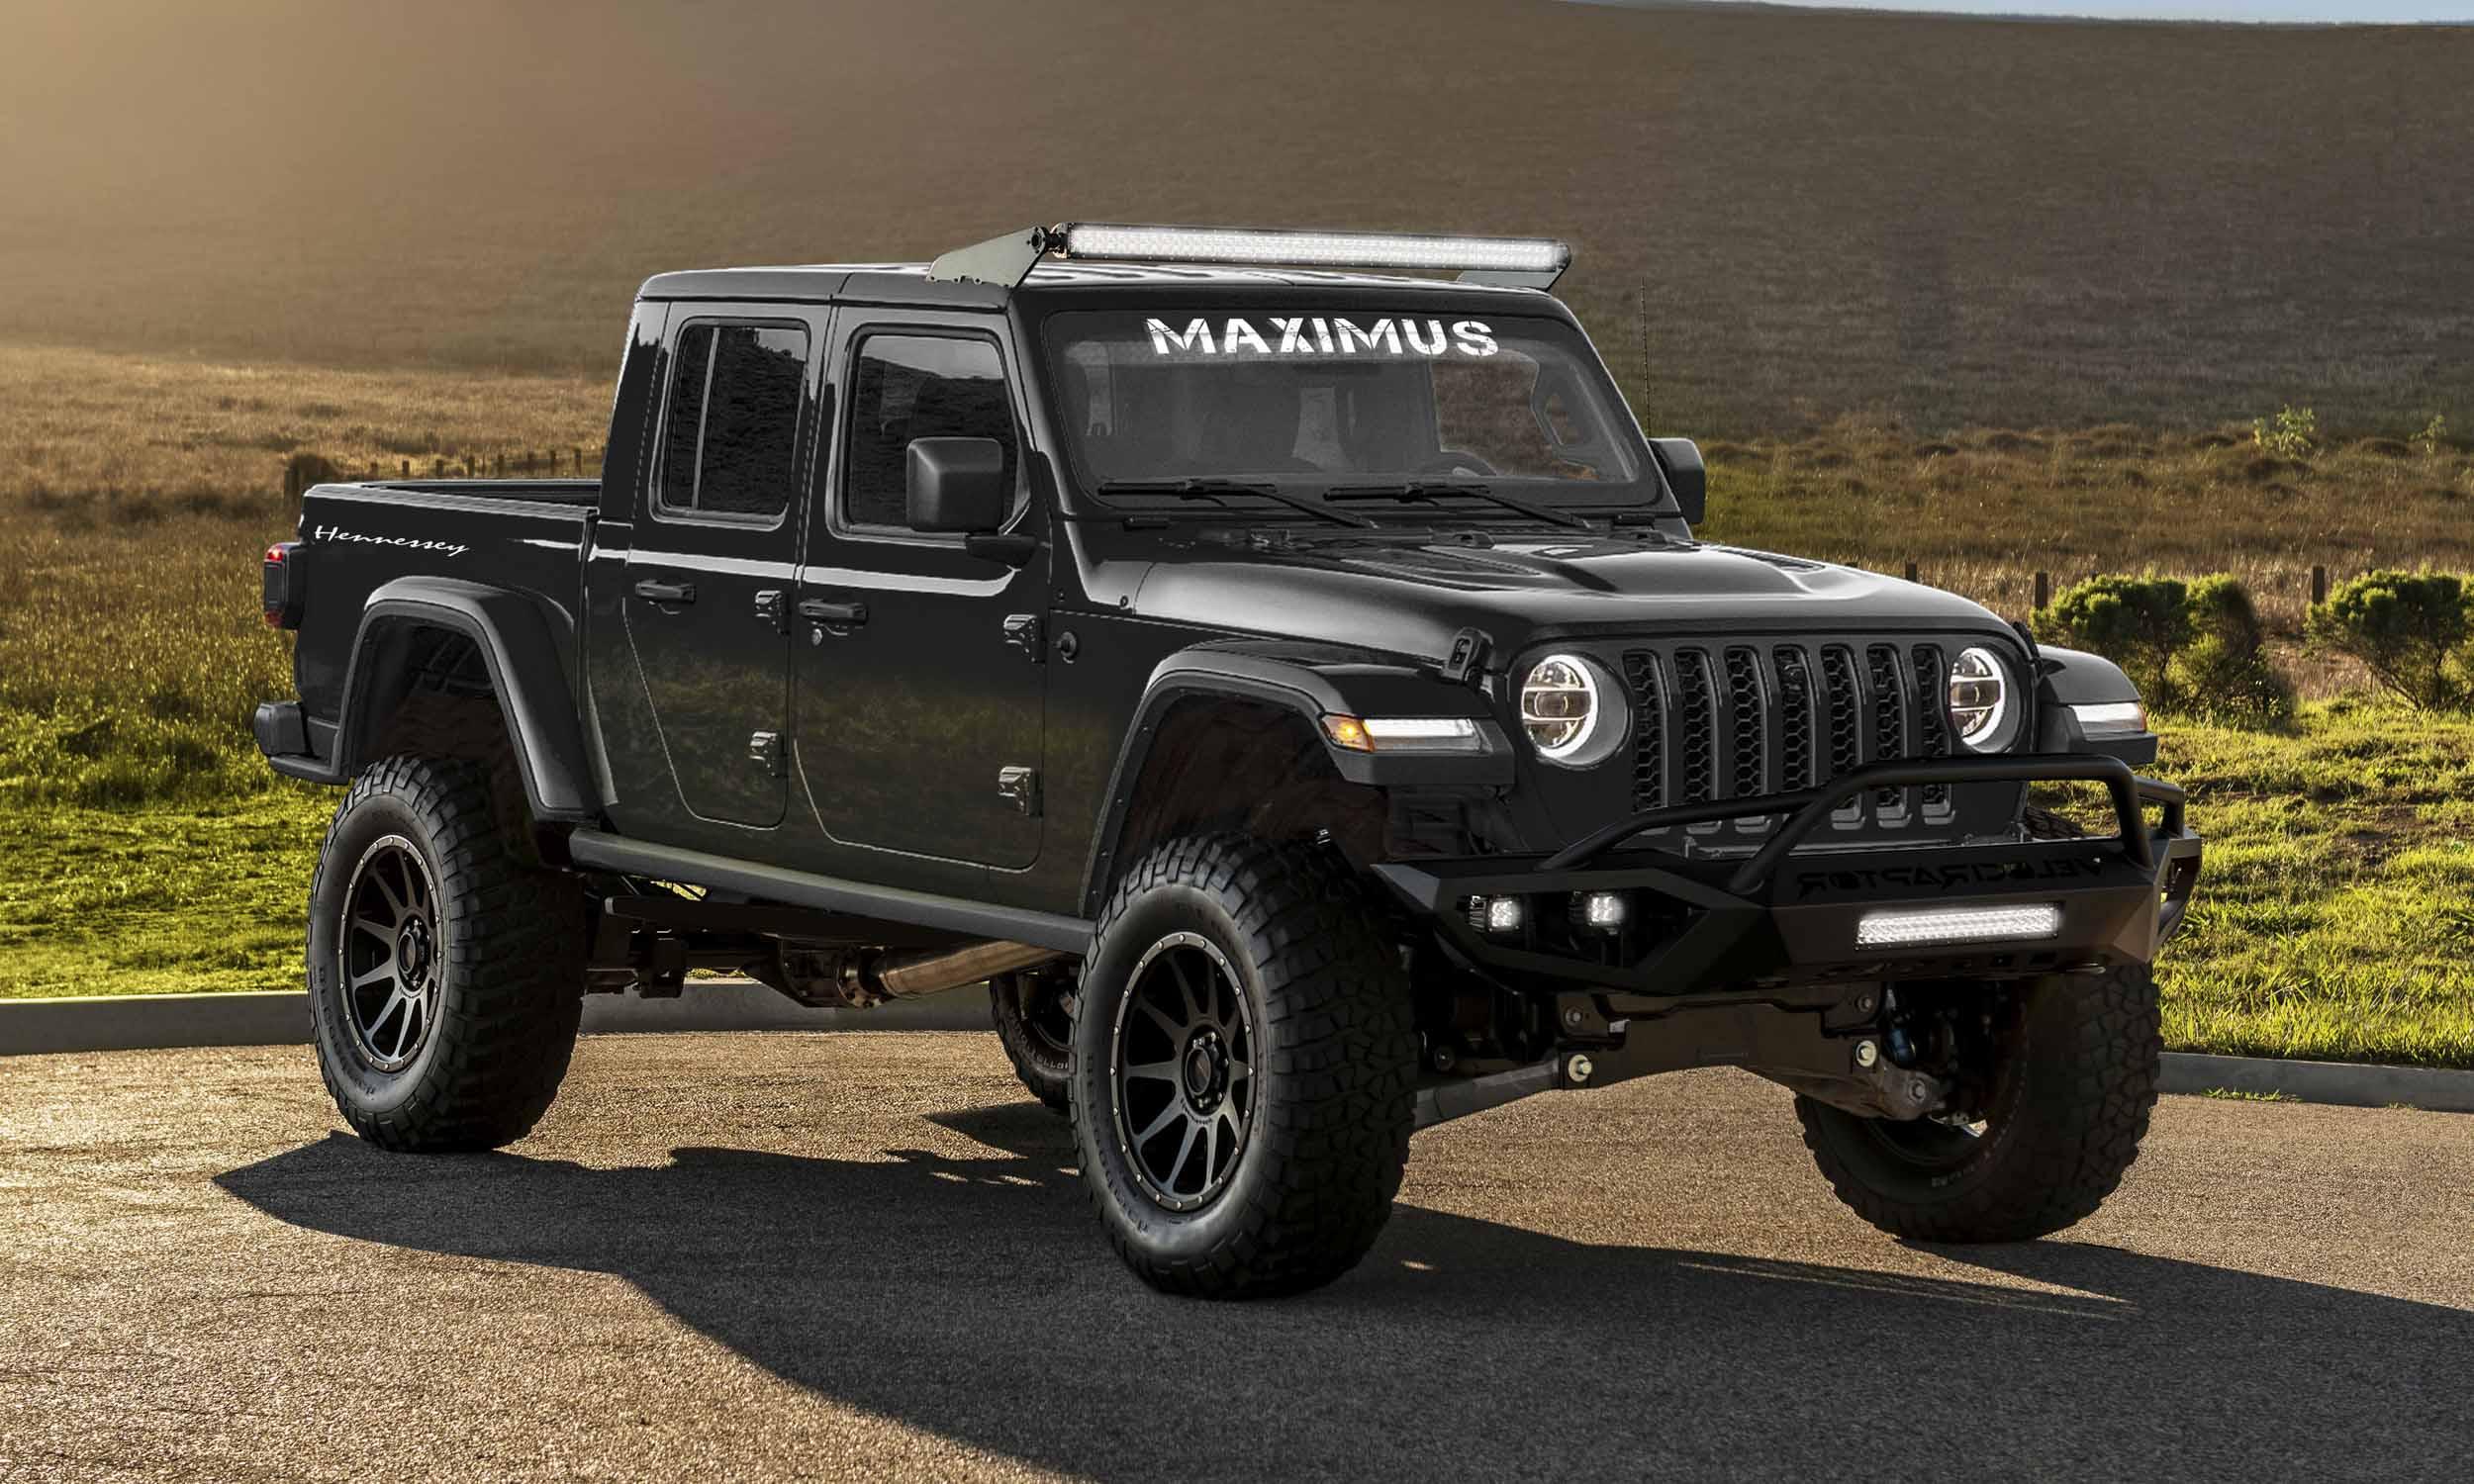 Jeep Gladiator MAXIMUS 1000 First Looknbsp